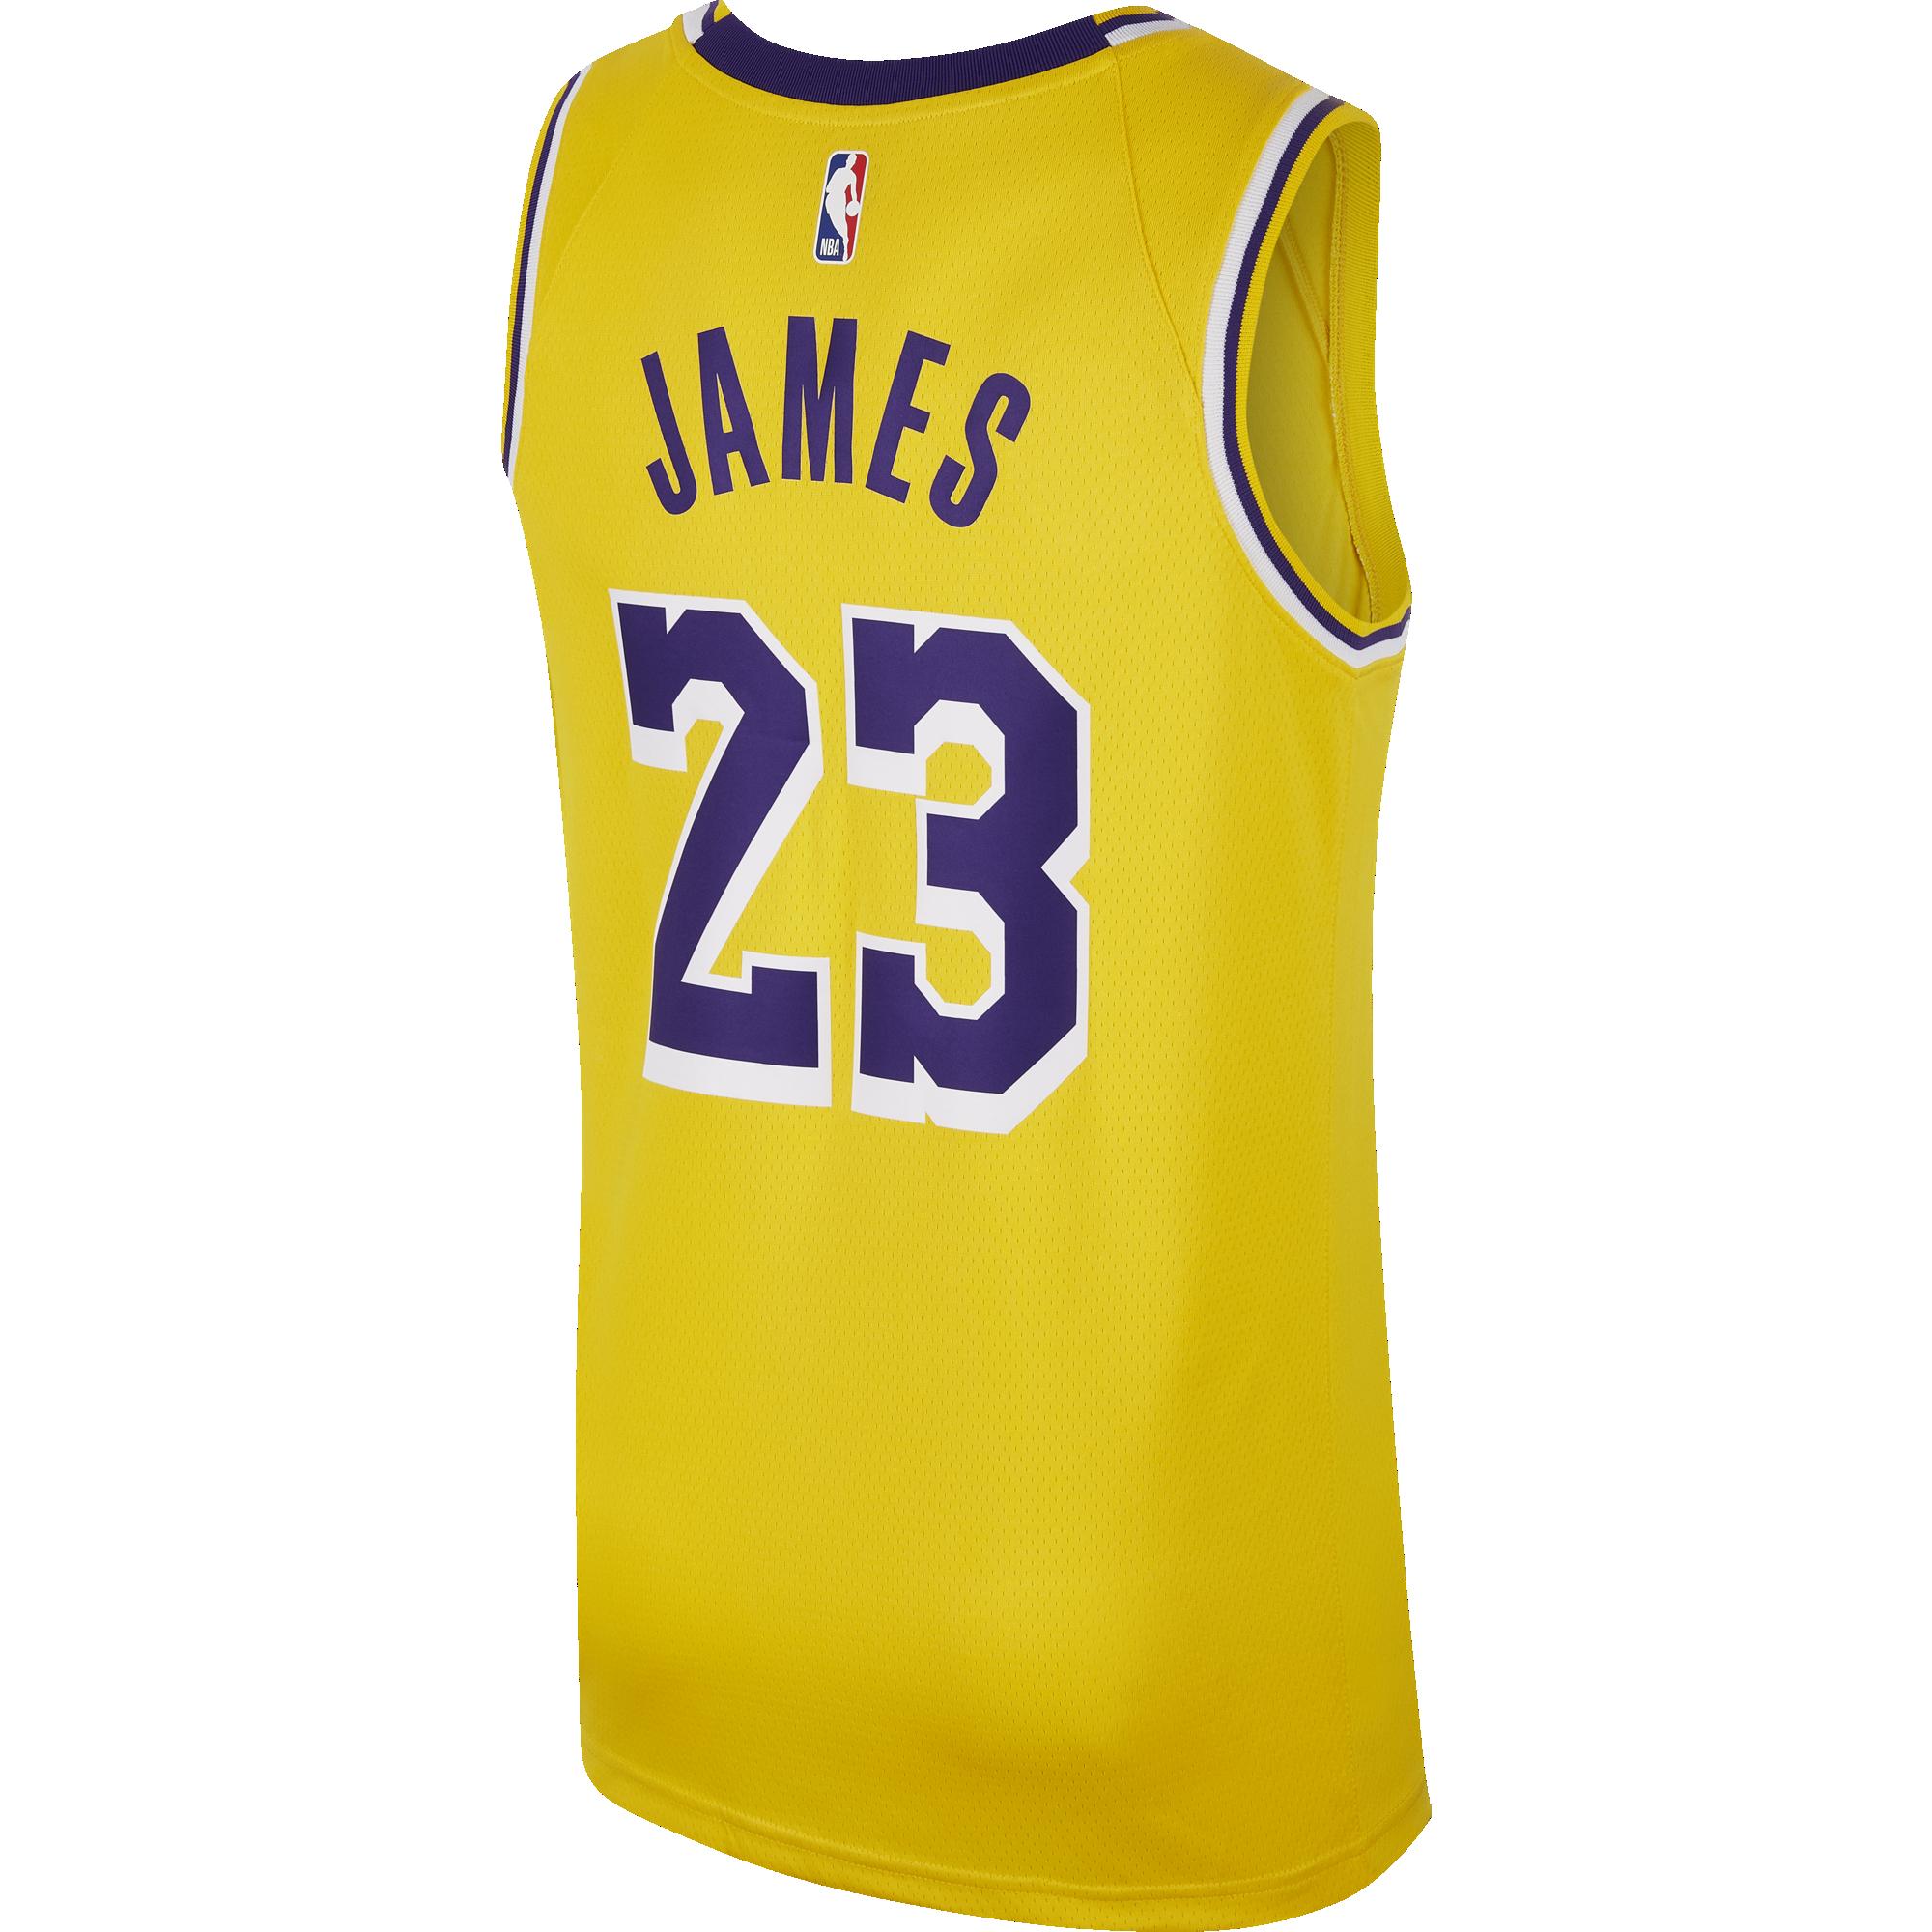 4e28c59ba75 NIKE NBA LOS ANGELES LAKERS LEBRON JAMES SWINGMAN ROAD JERSEY. Previous Next